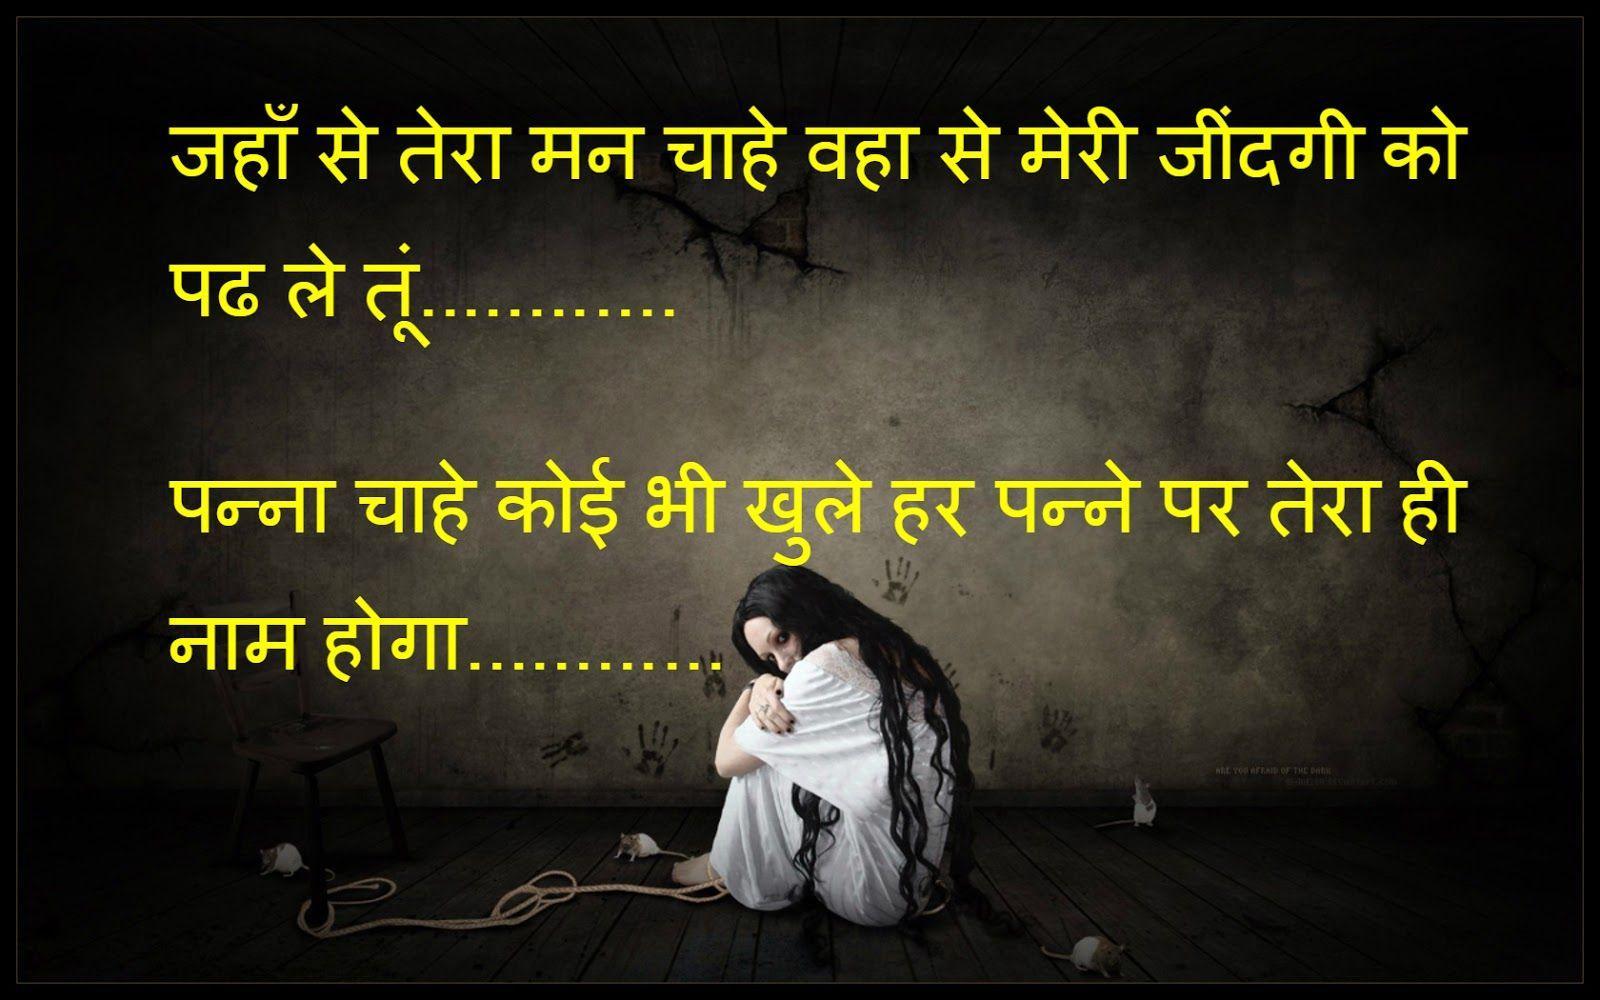 Love image hindi shayri download